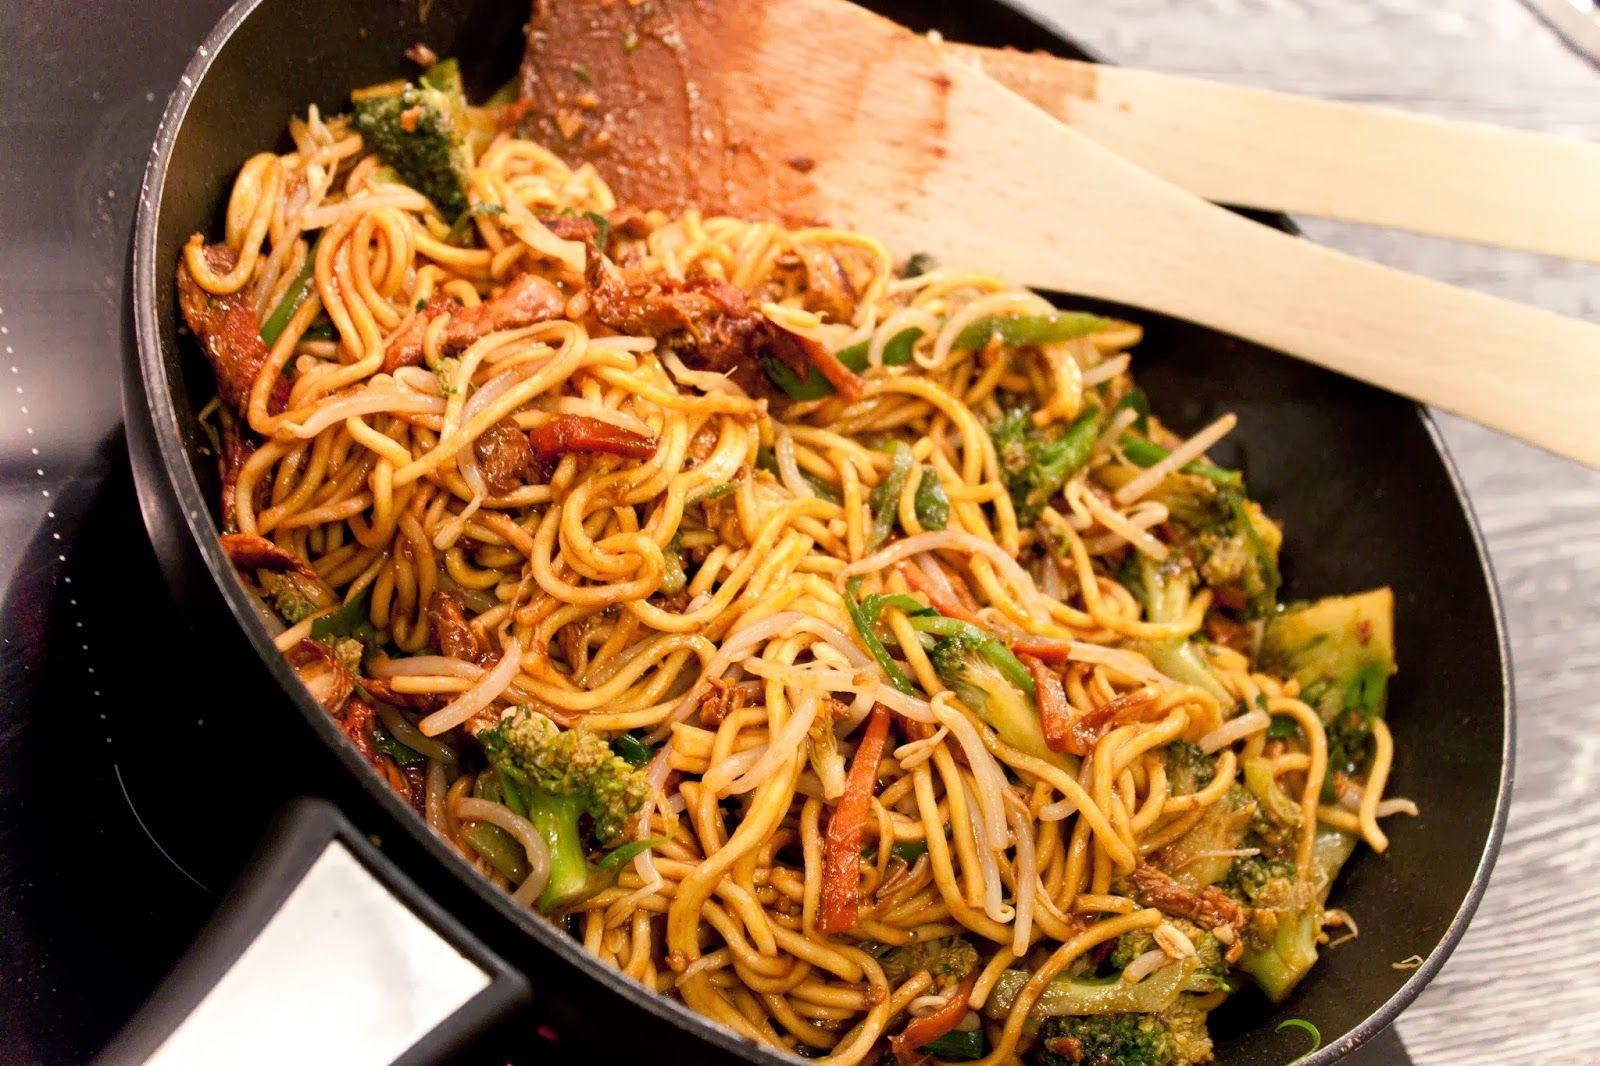 Cucinare con amore nsk nudle s ku ec m masem recepty for Cucinare noodles